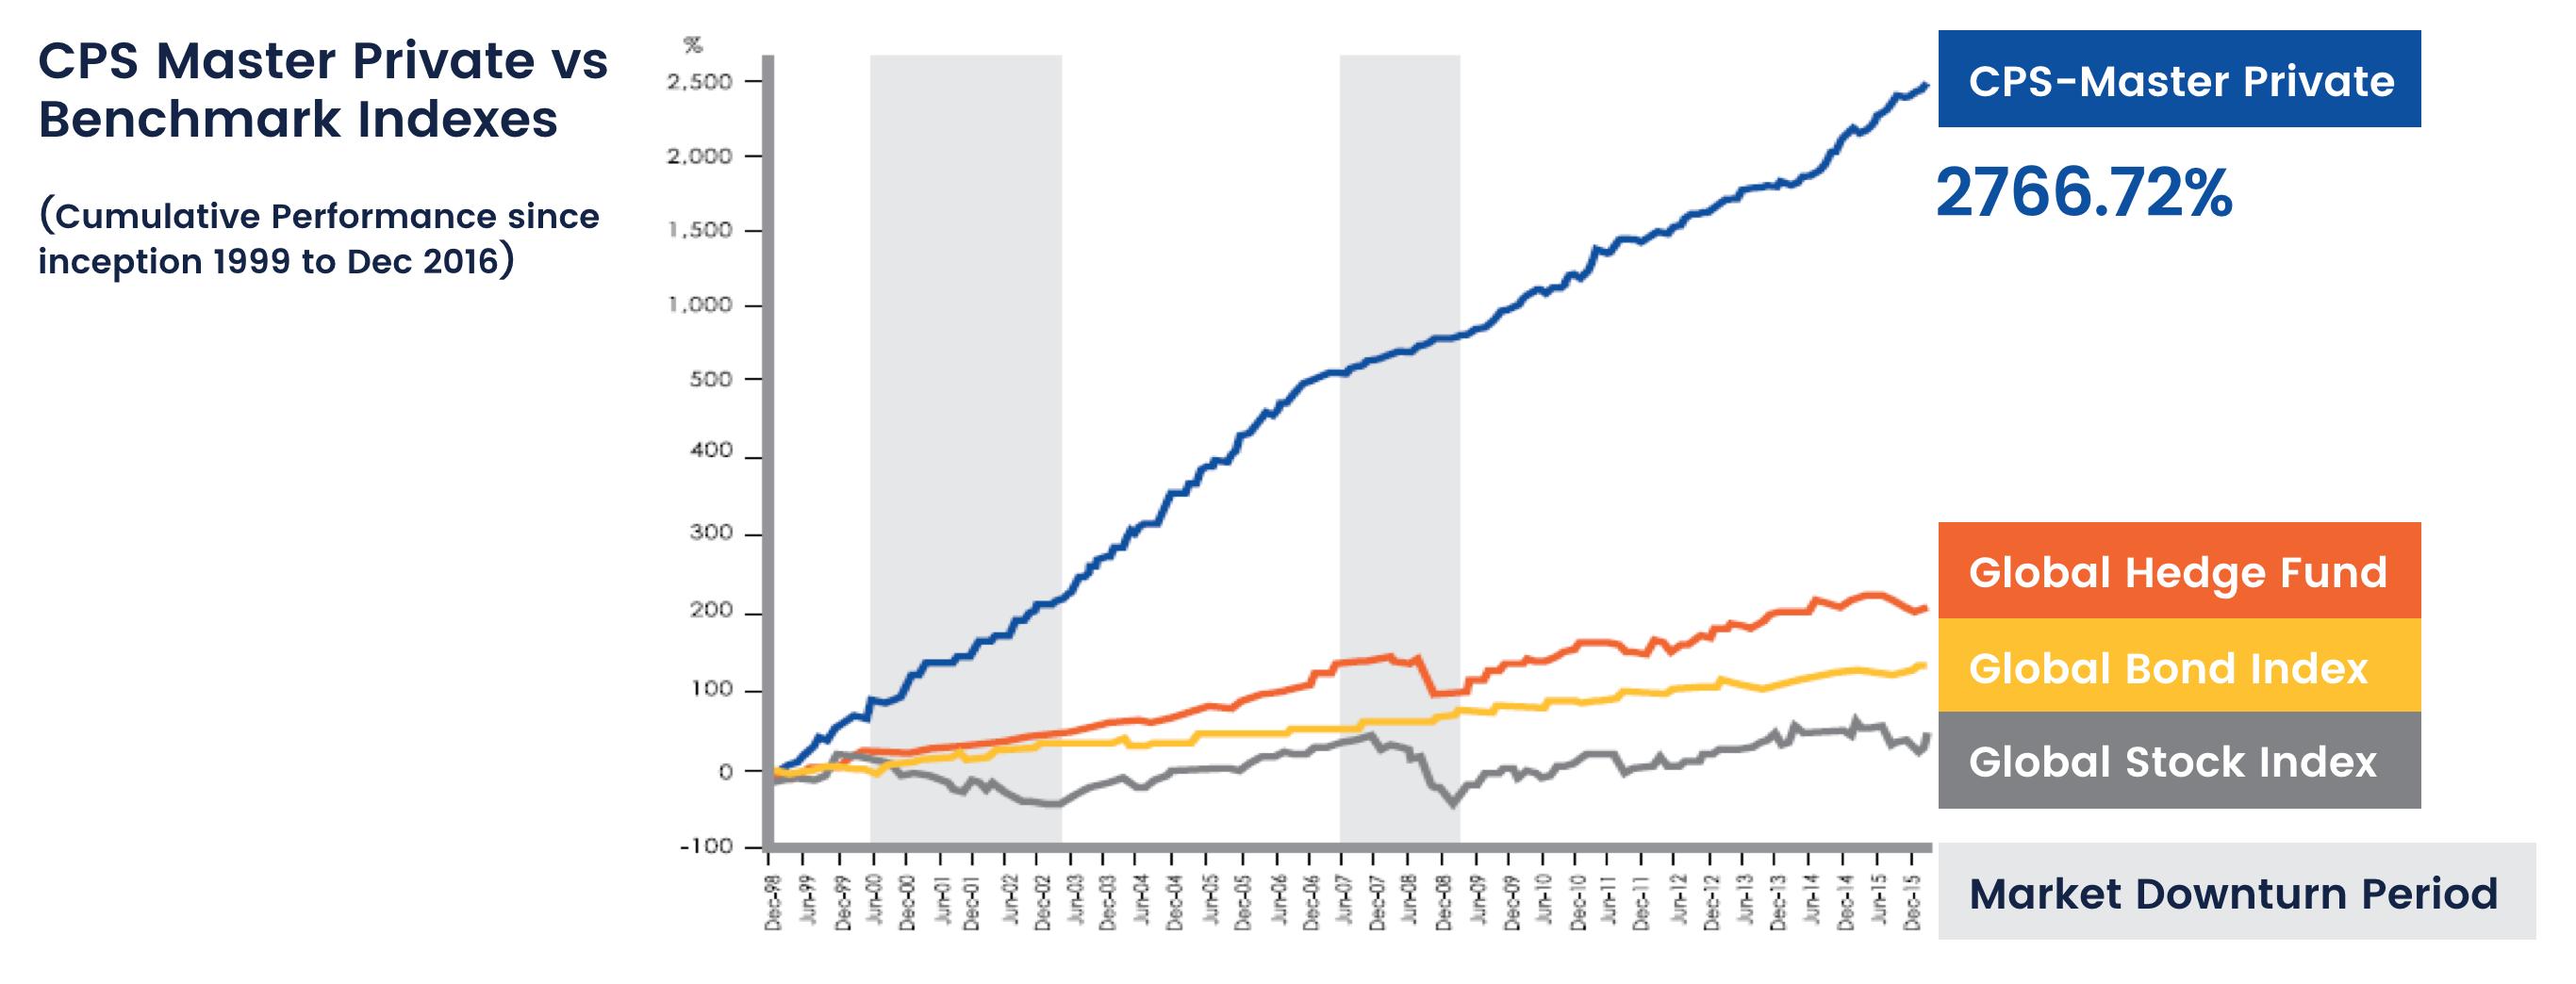 cp-global-mutual-funds-vs-hedge-funds-cps-cumulative-performance